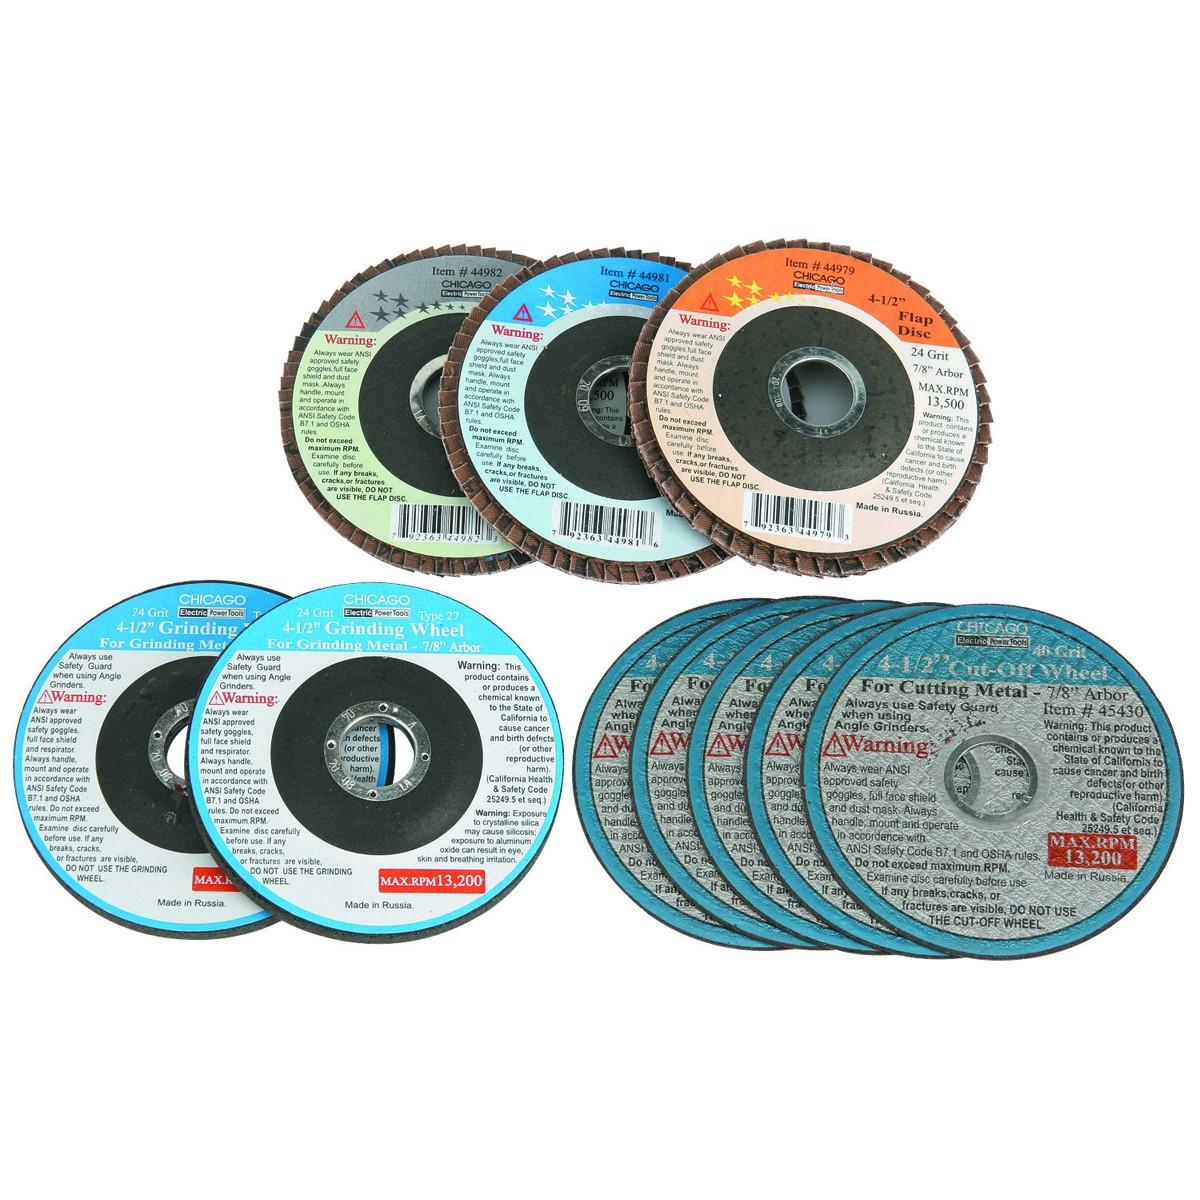 Cutting Wheel/Flap Wheel/Grinding Wheel – NEWCORE GLOBAL PVT. LTD